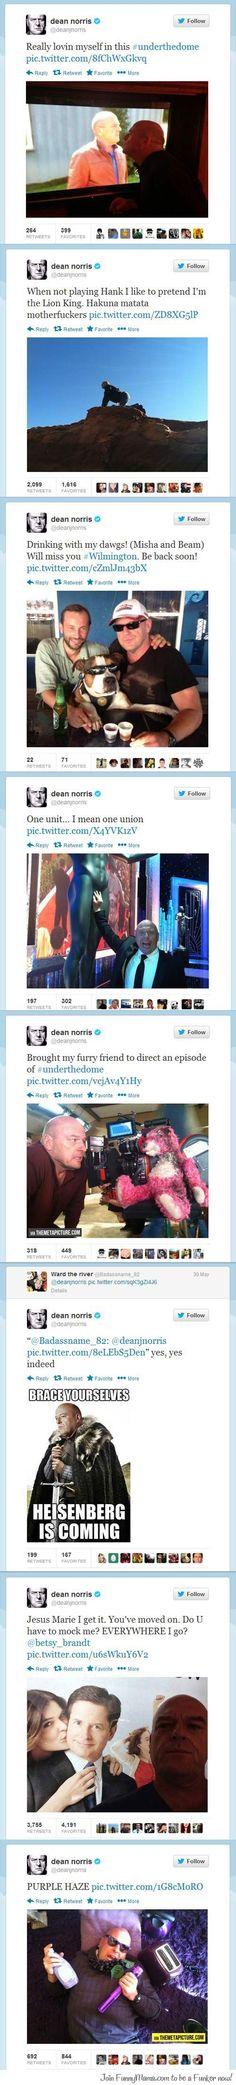 Breaking Bad's Dean Norris on Twitter